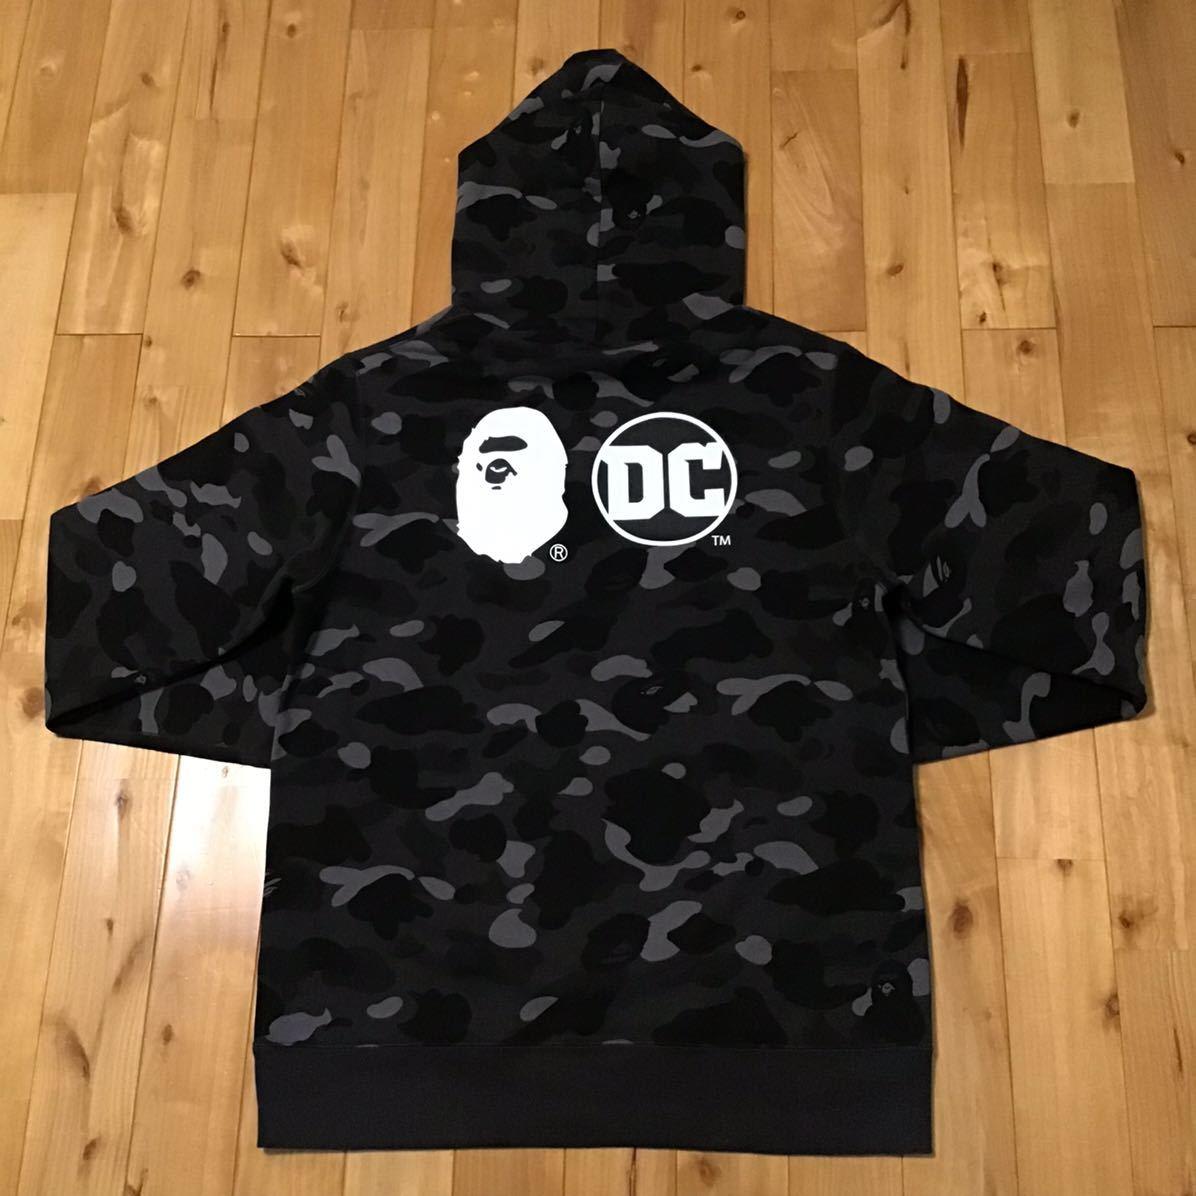 ★2XL★ DC Comics × BAPE スーパーマン プルオーバー パーカー a bathing ape pullover hoodie superman エイプ ベイプ black camo XXL